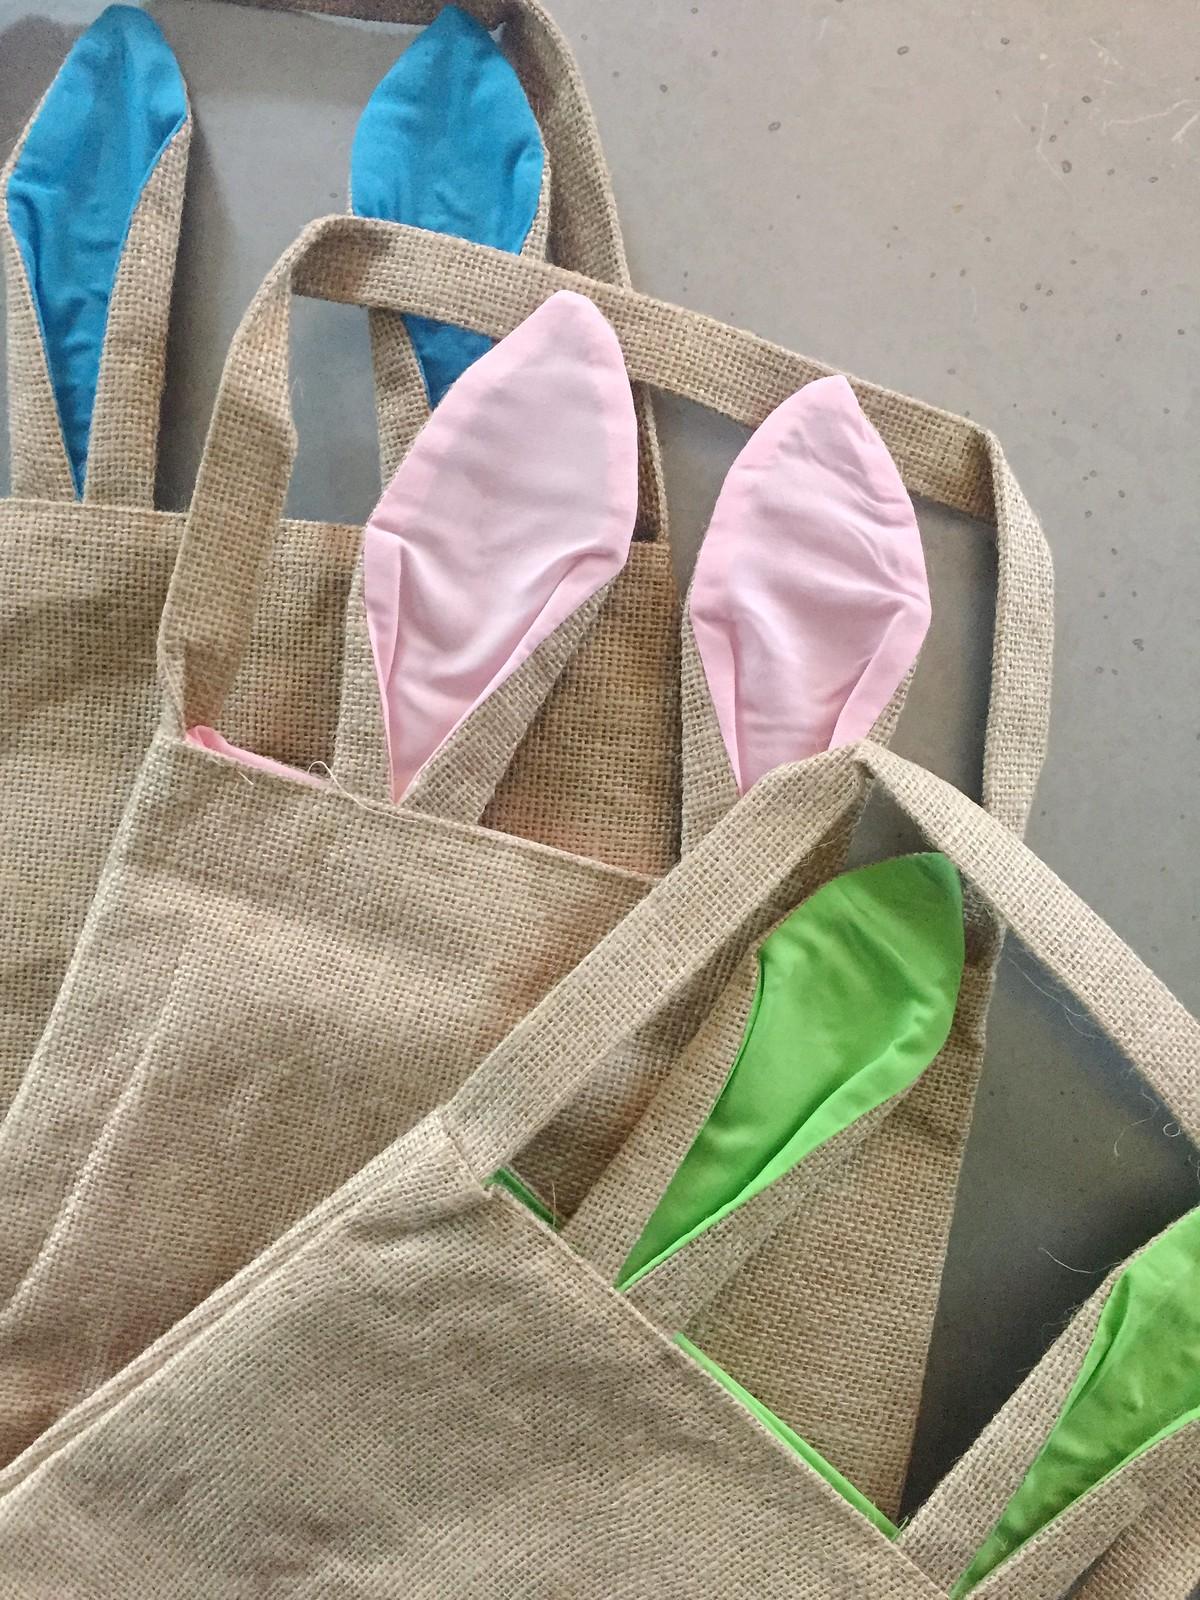 DIY No-Sew Easter Baskets